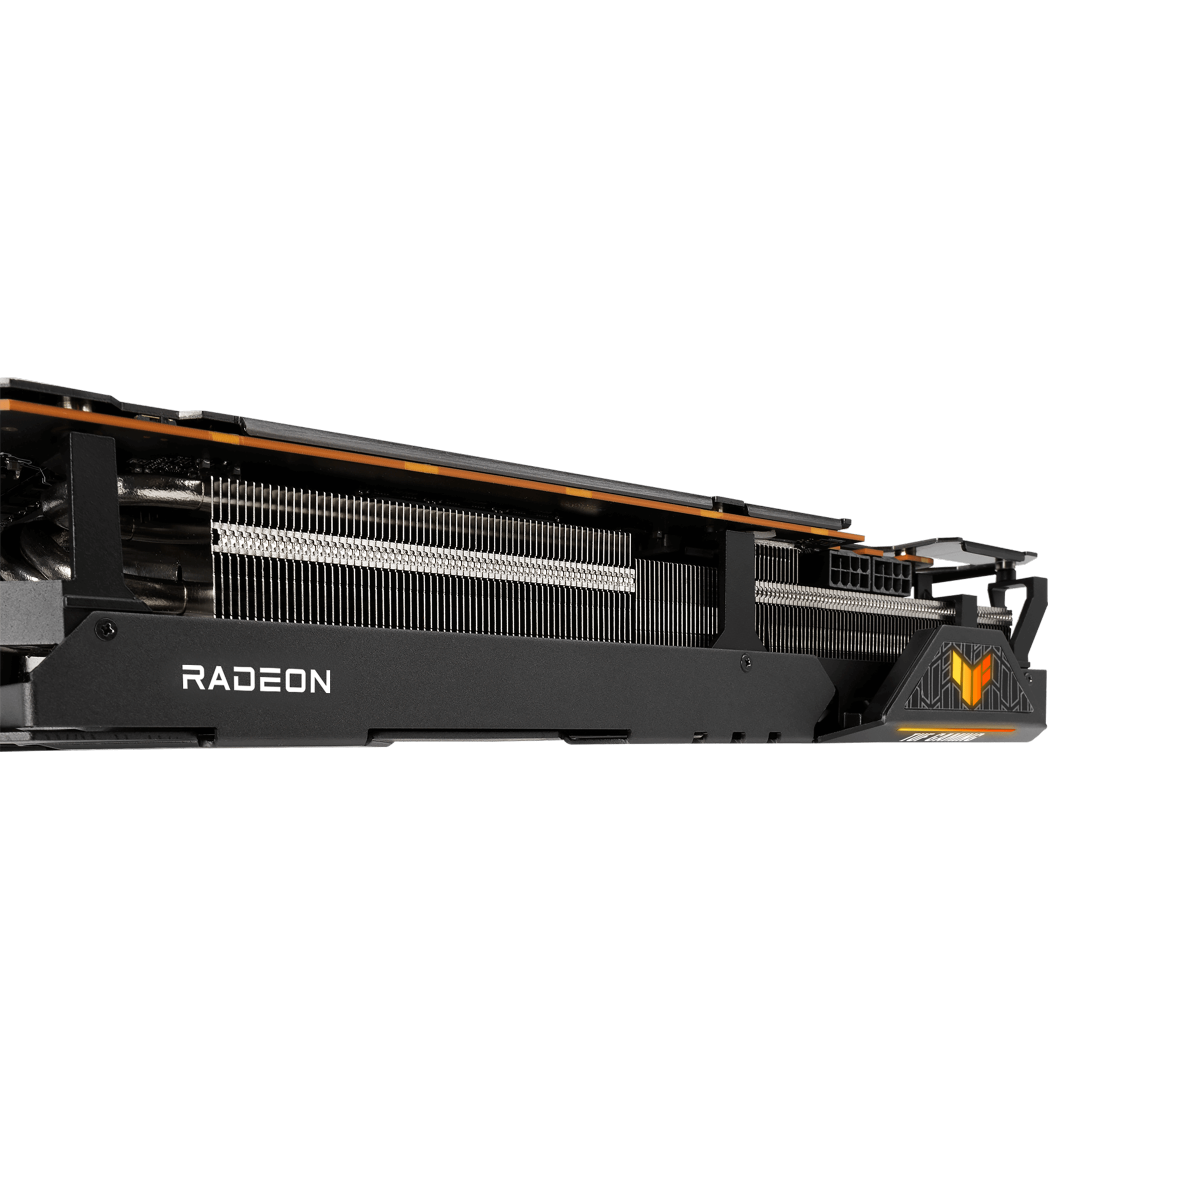 Placa de Vídeo Asus, TUF Gaming, Radeon RX 6800, 16GB, GDDR6, 256bit, 90YV0FM1-M0NA00